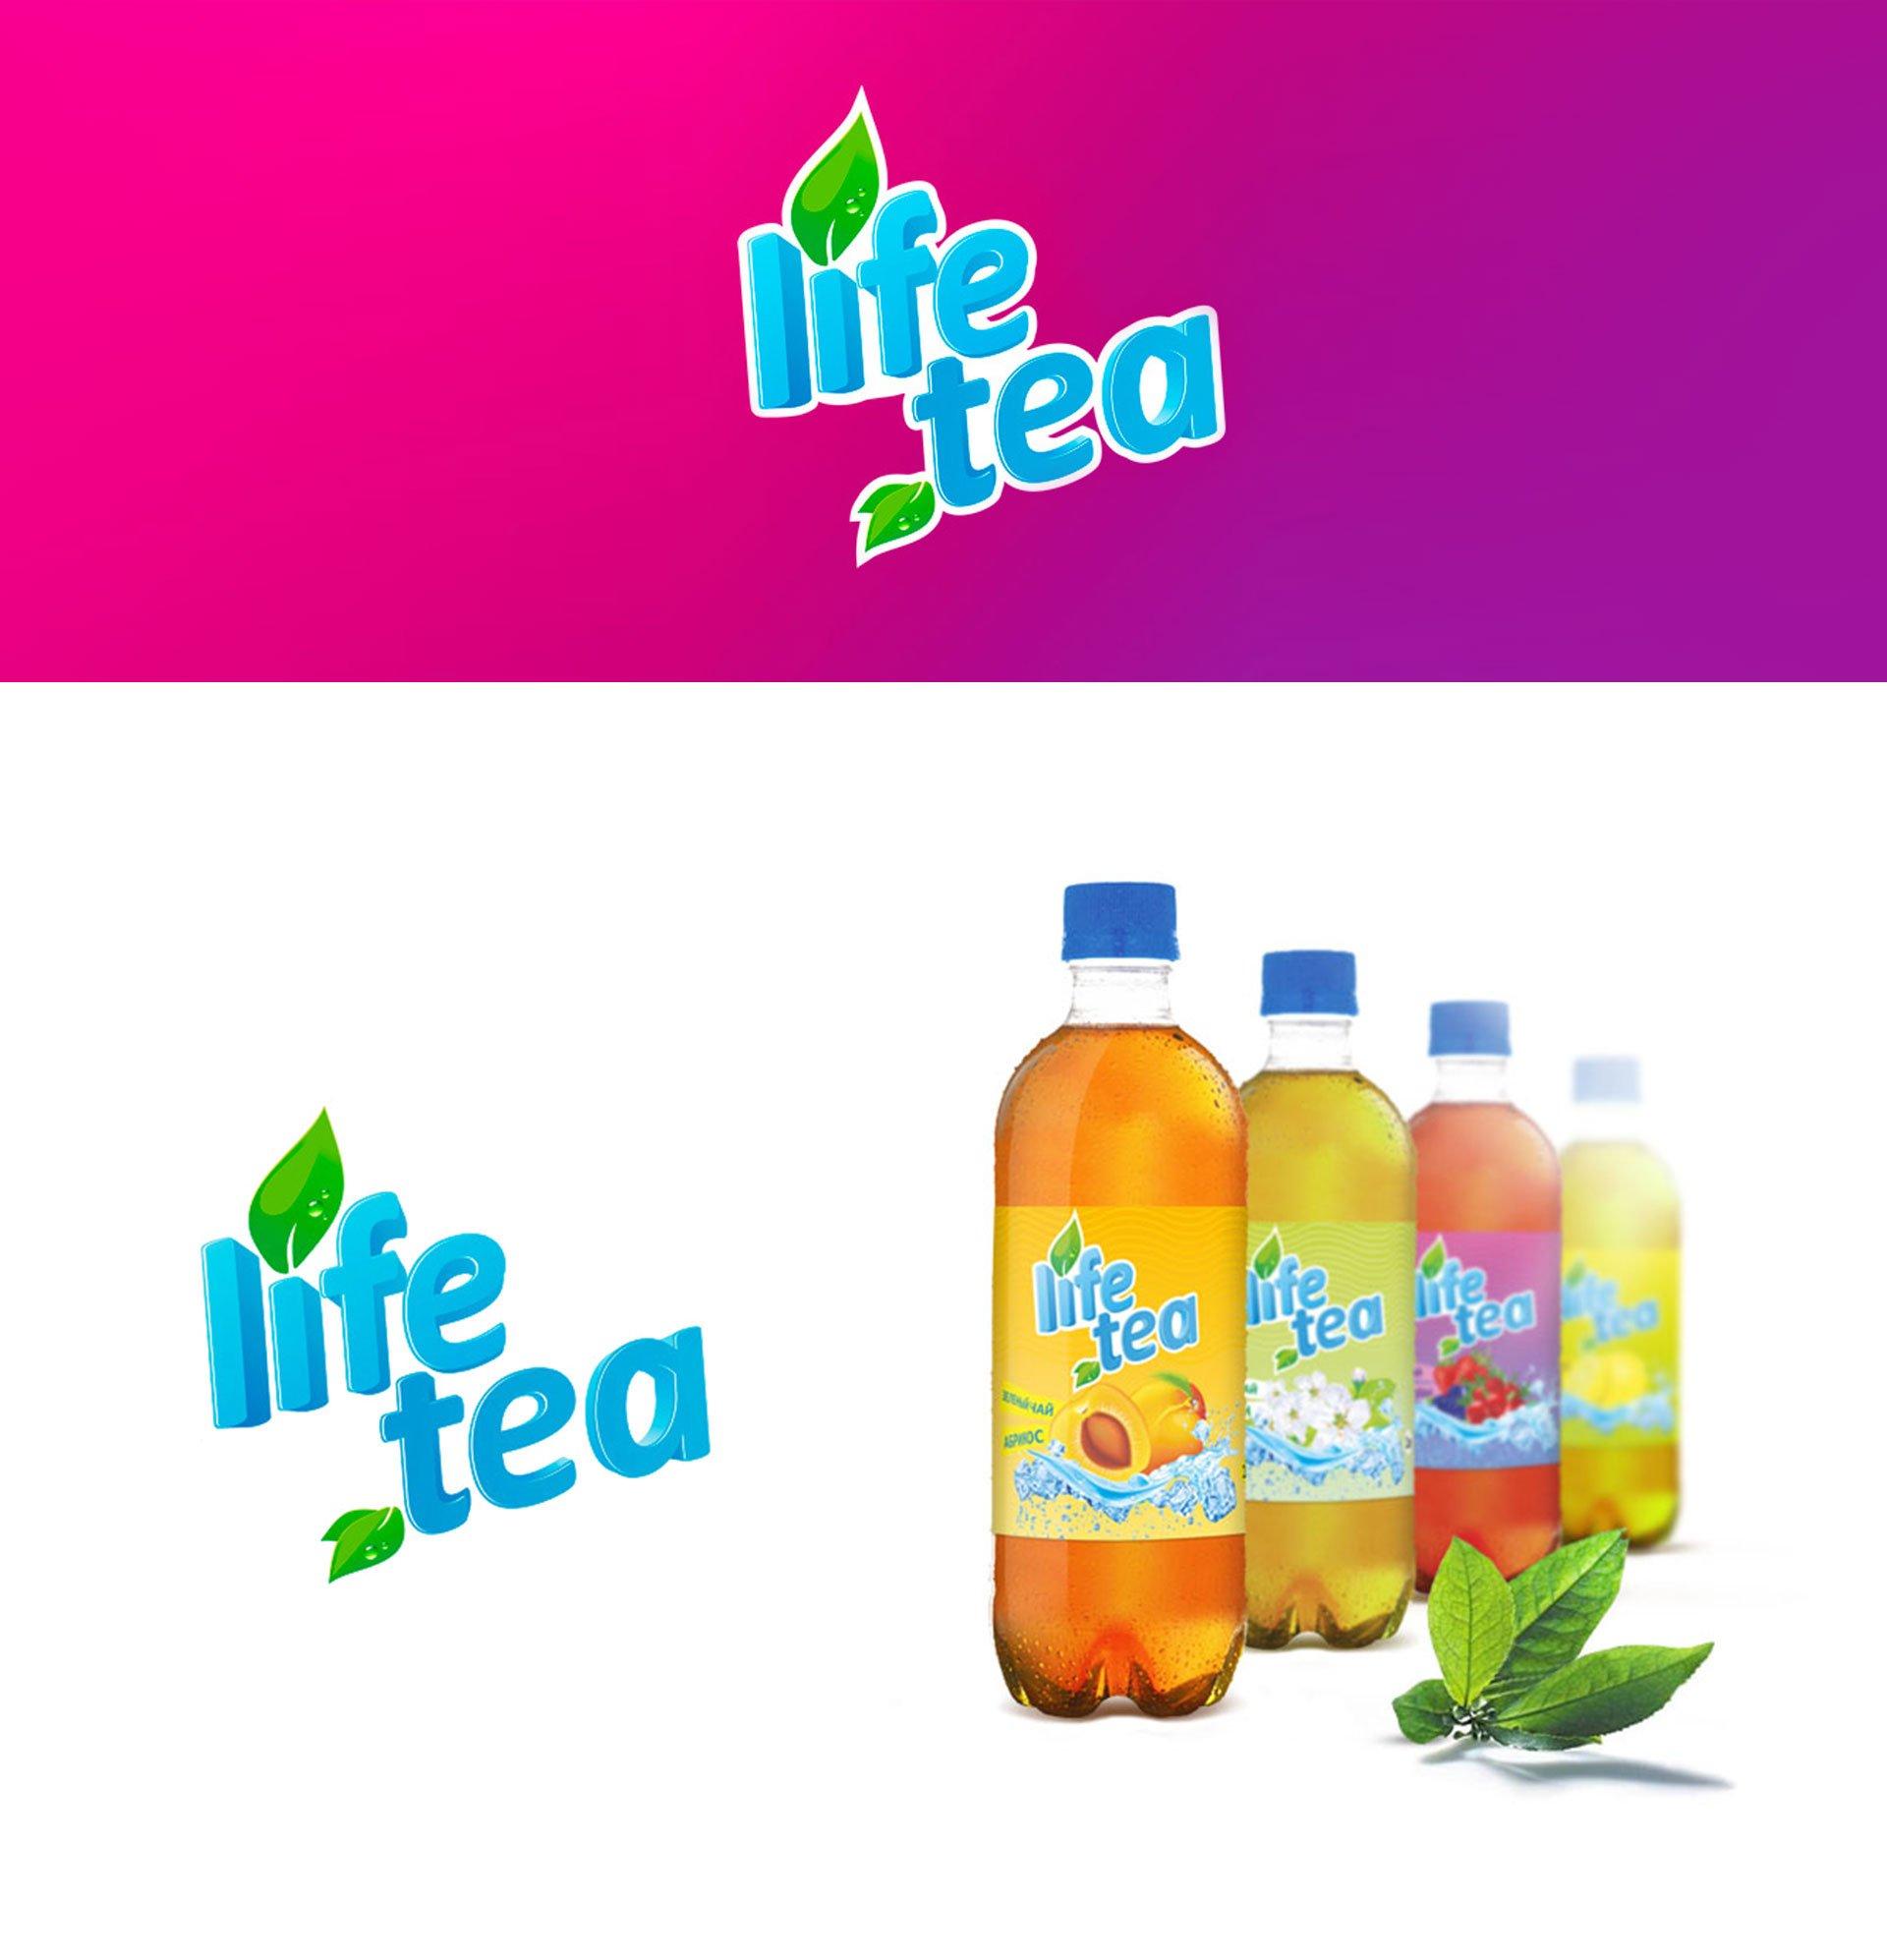 Life_Tea_01